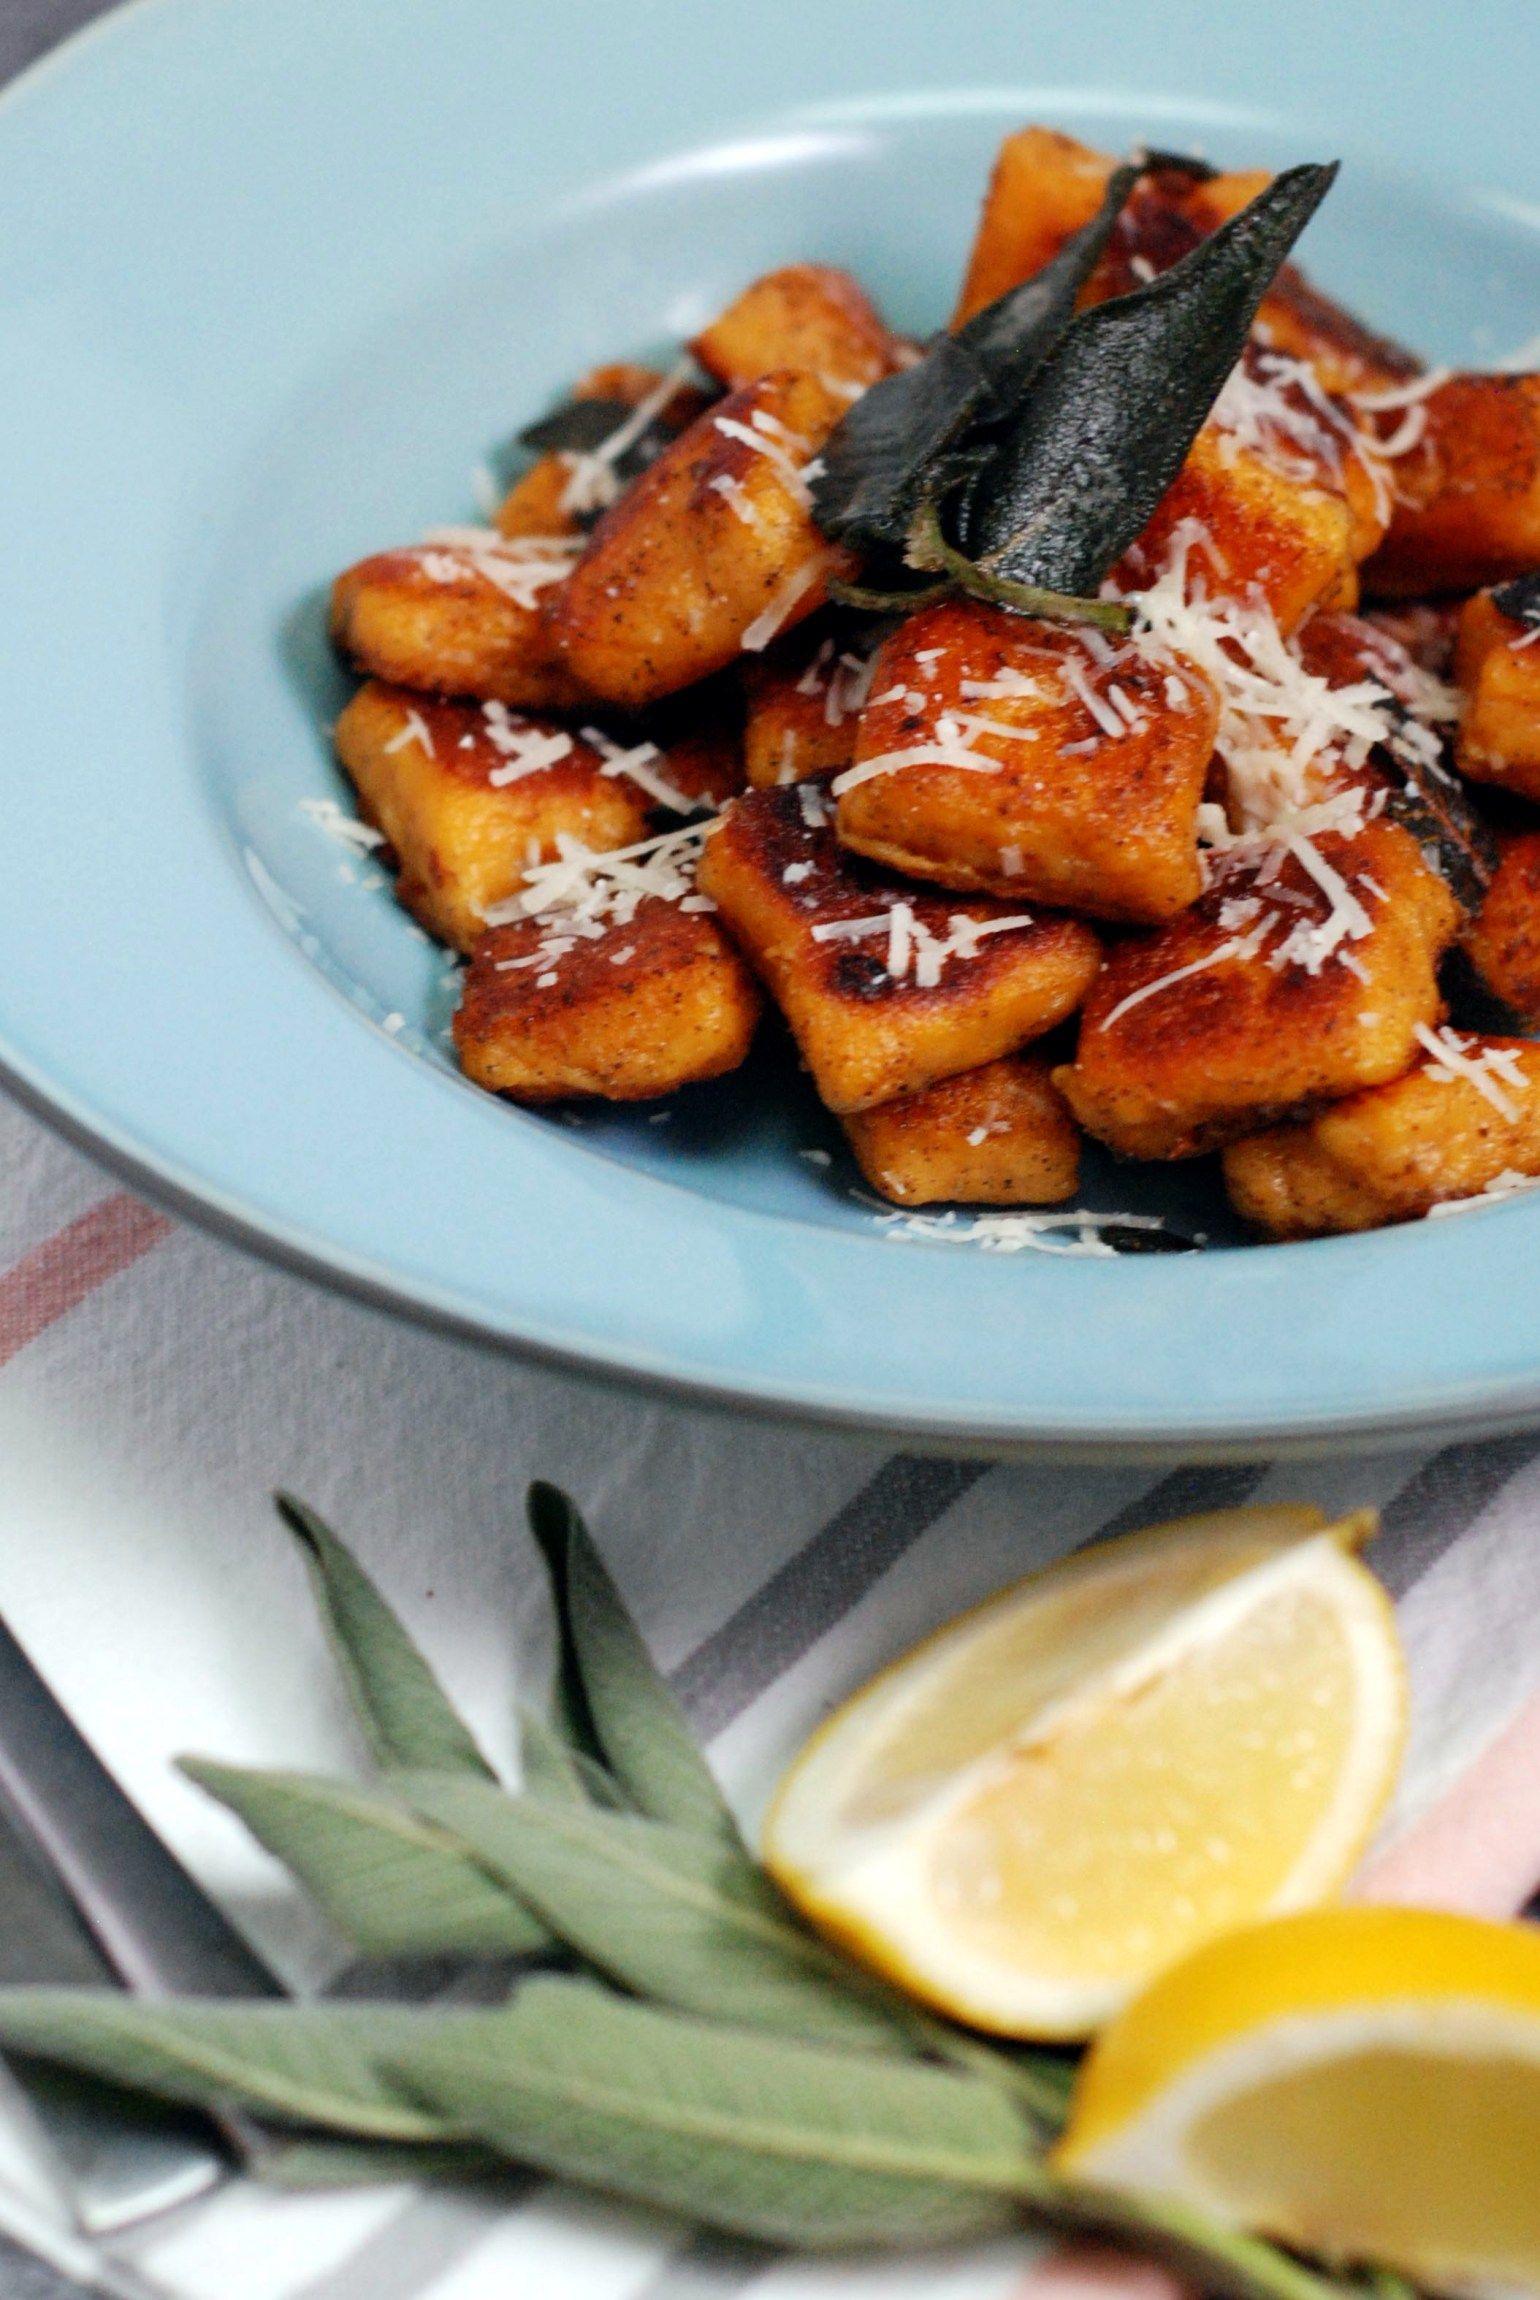 Chrissy Teigen S Sweet Potato Gnocchi Cheesecake For Breakfast Sweet Potato Gnocchi Gnocchi Gnocchi Recipes